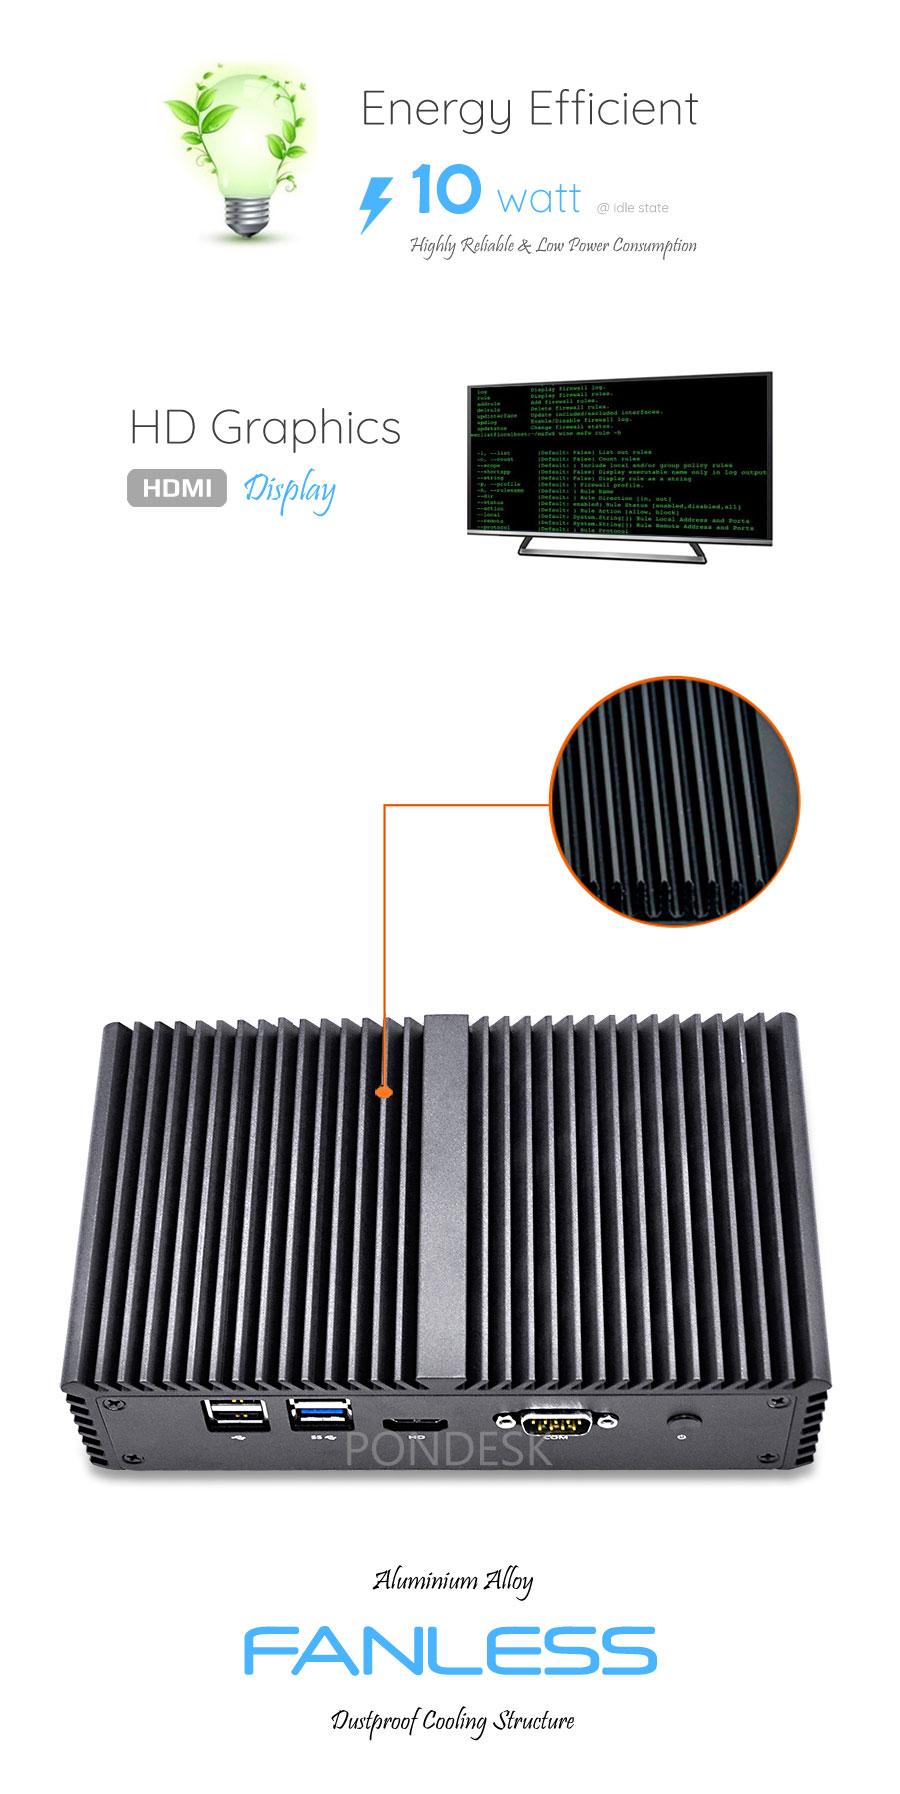 Intel® i3-4005U 4 LAN 1 COM WiFi 4G Fanless Firewall Router - MNHO-036 | Image